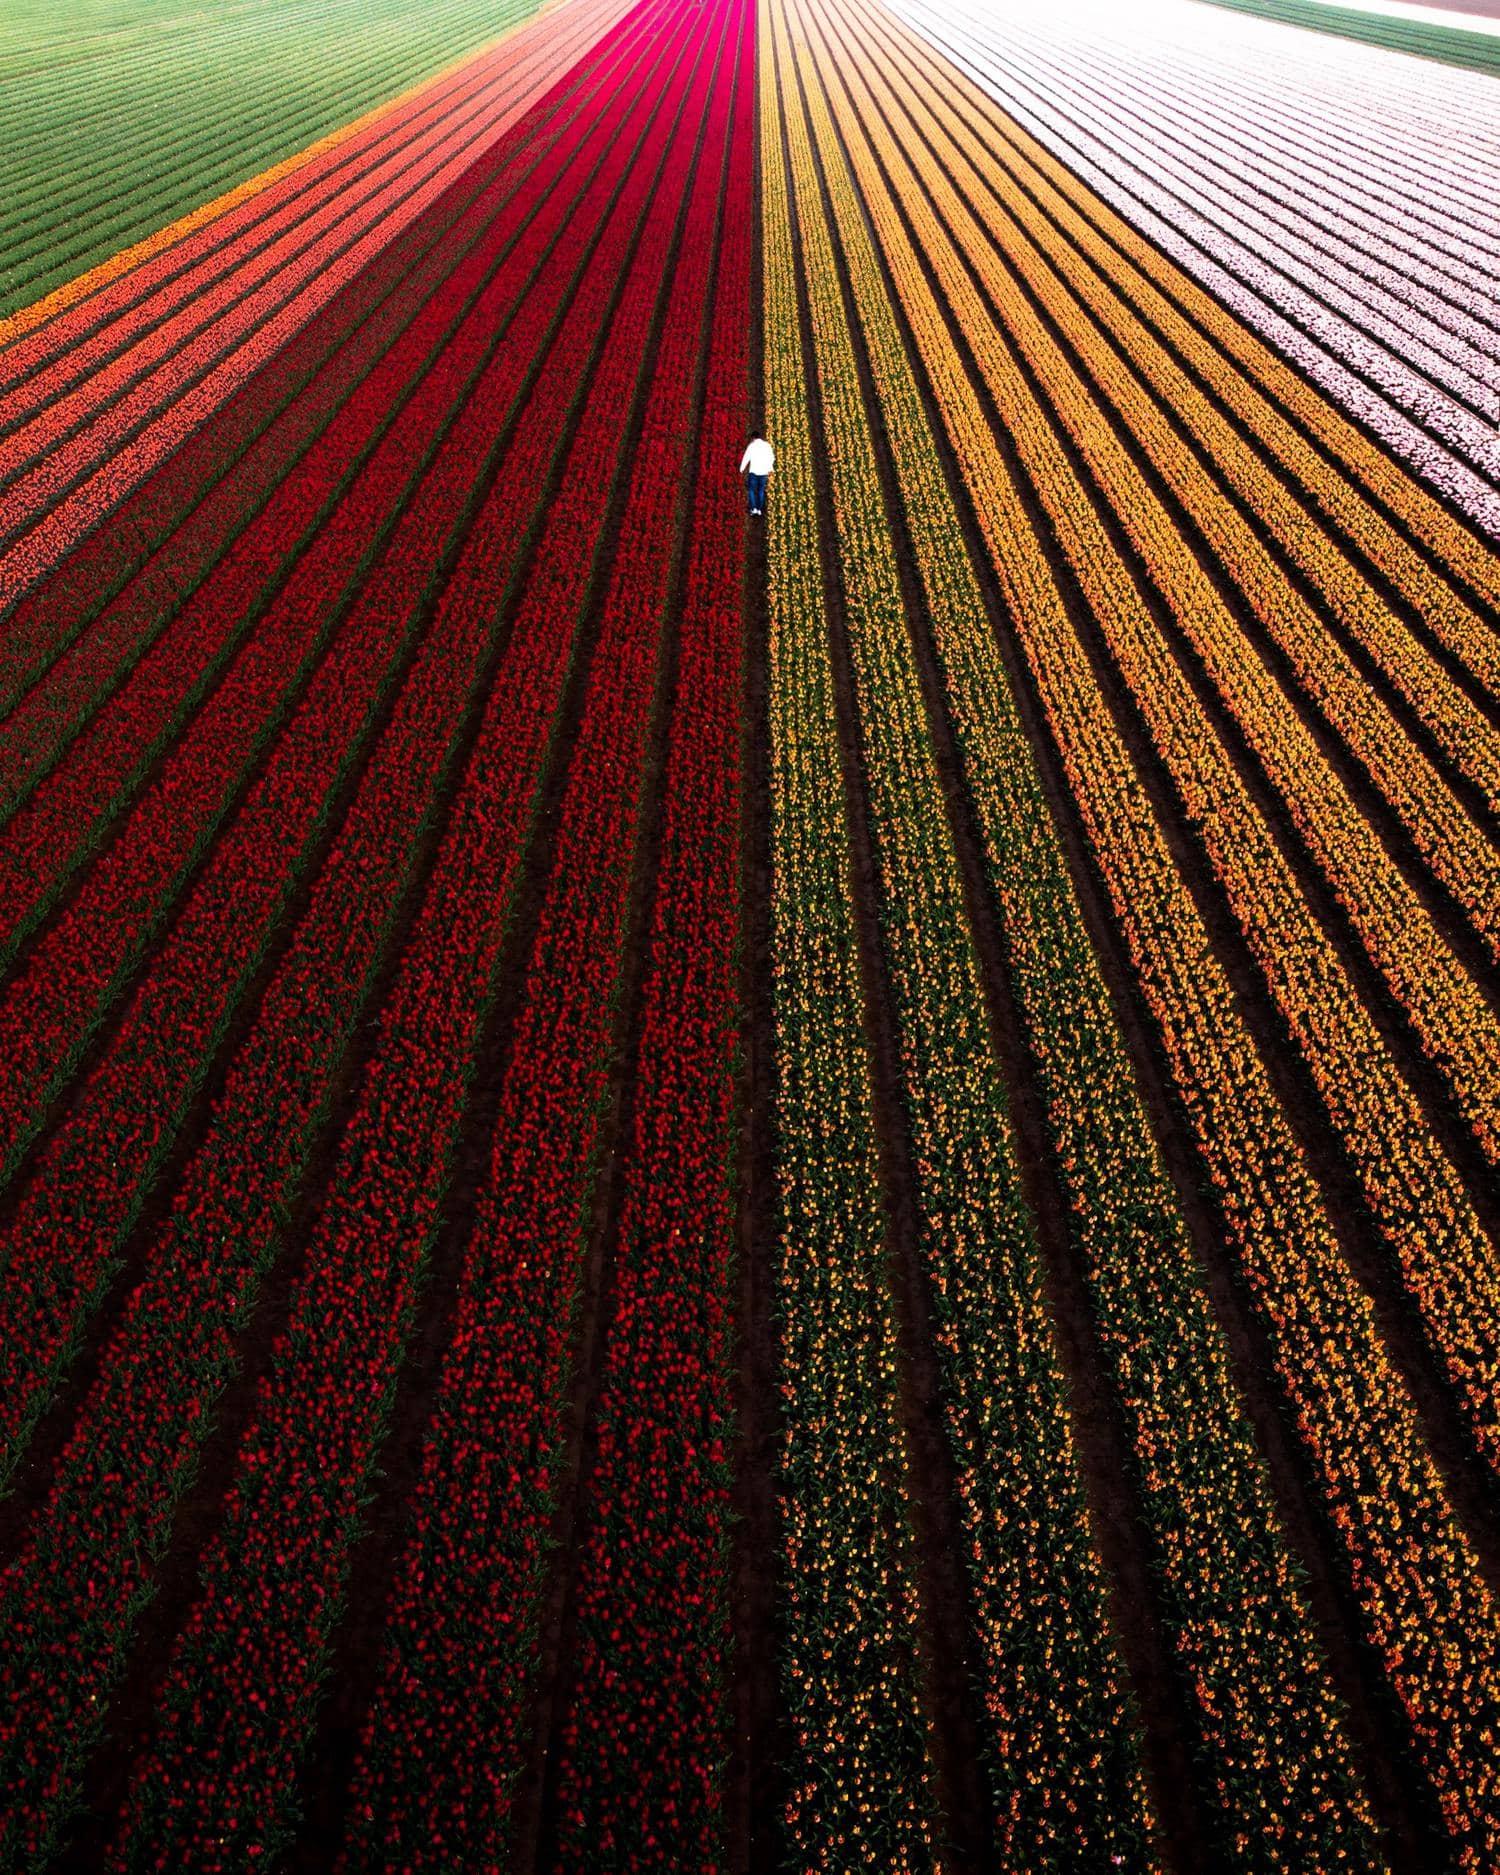 Campos de flores con líneas